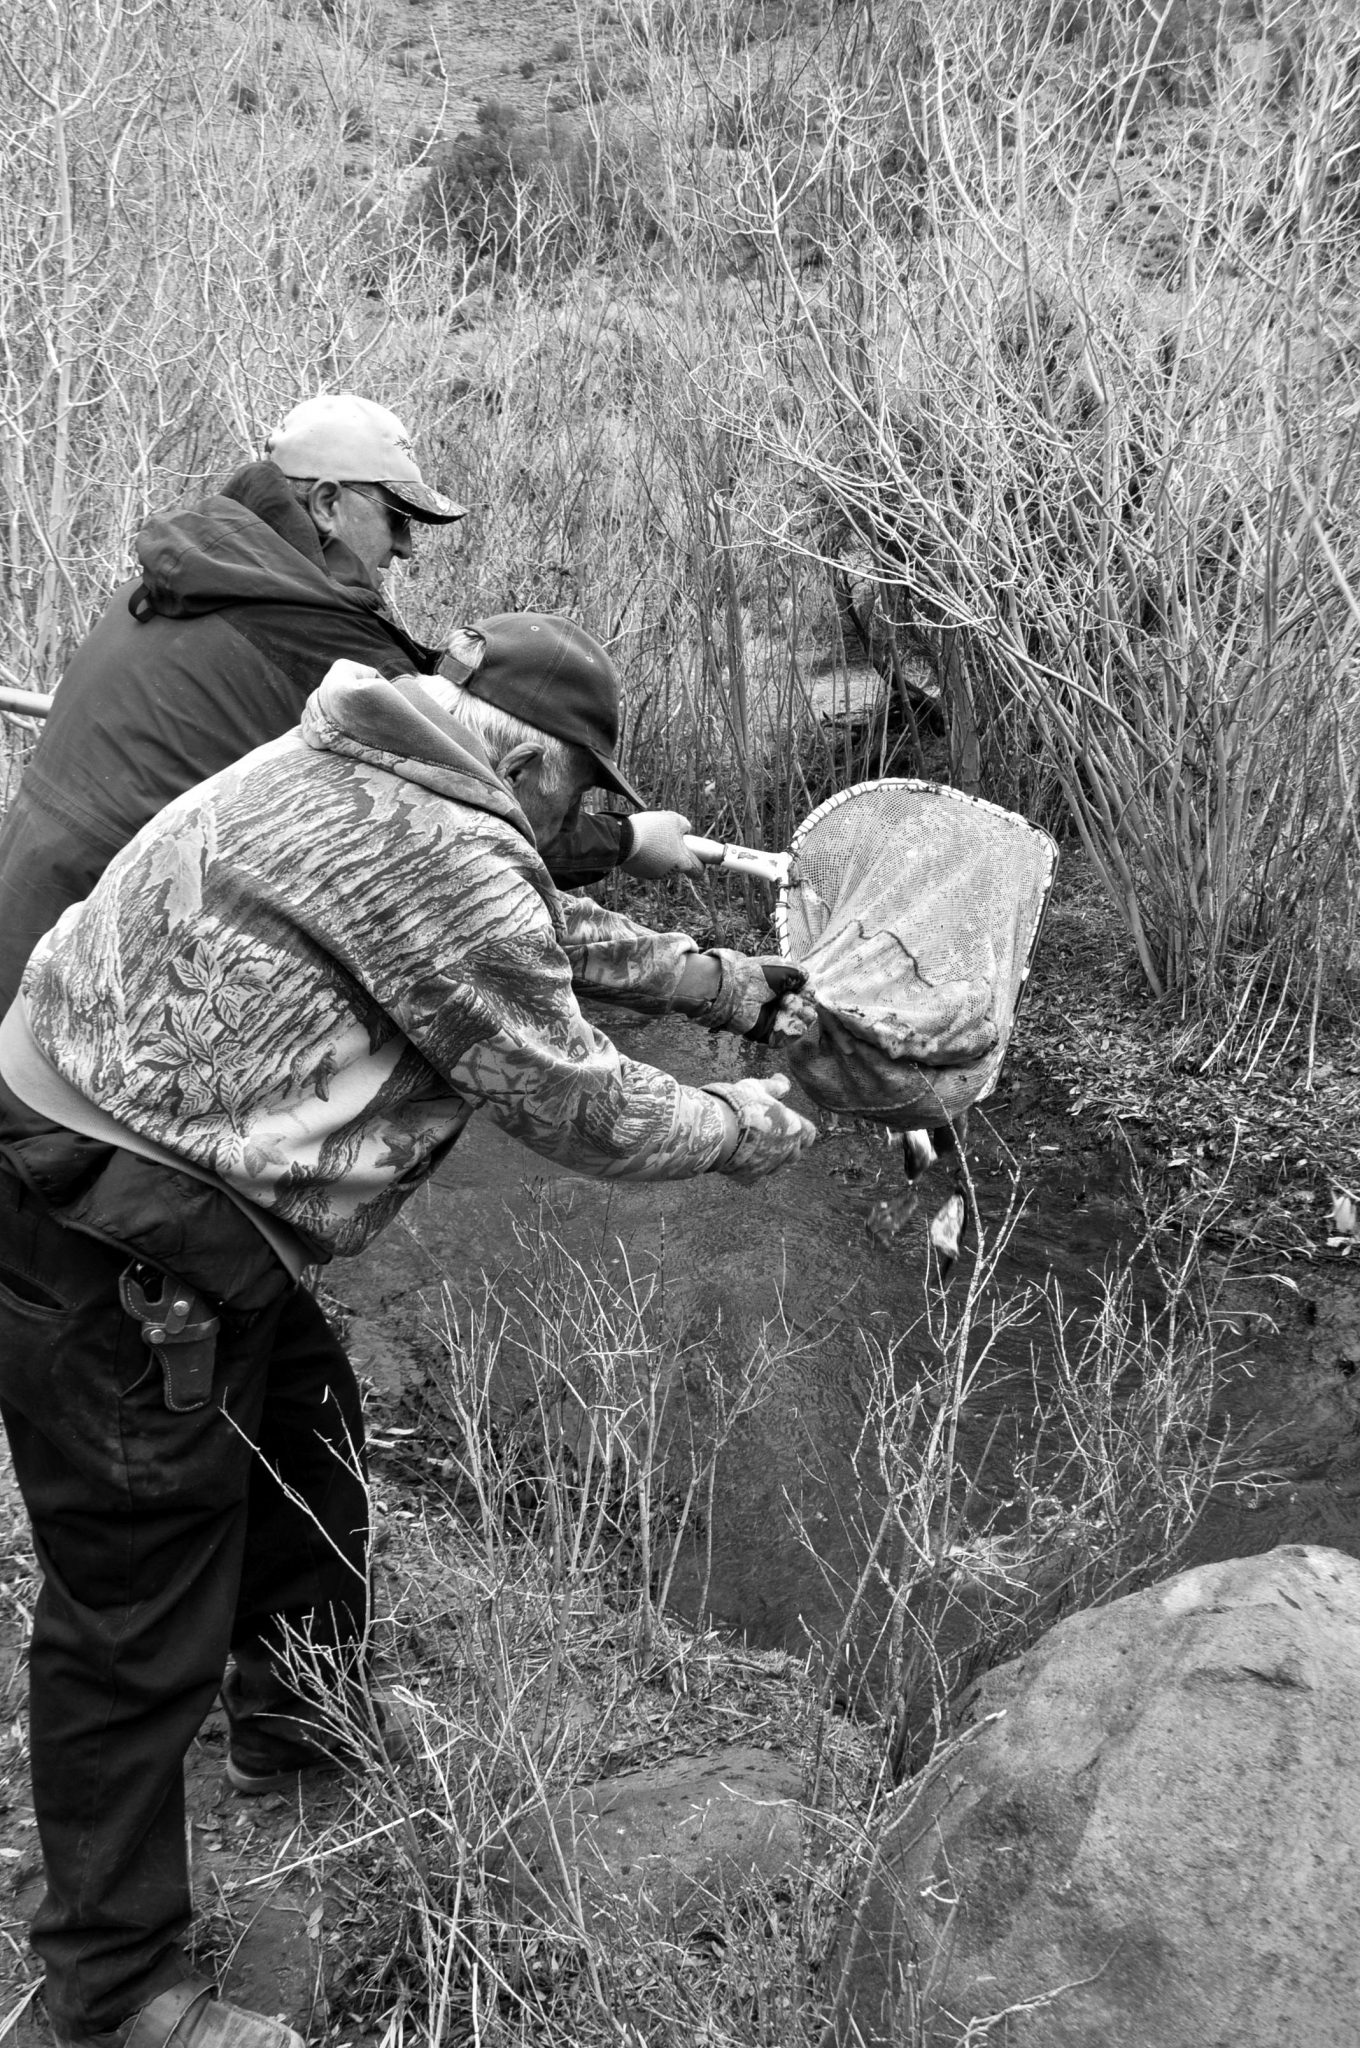 Local wildlife leaders stock Rough Creek